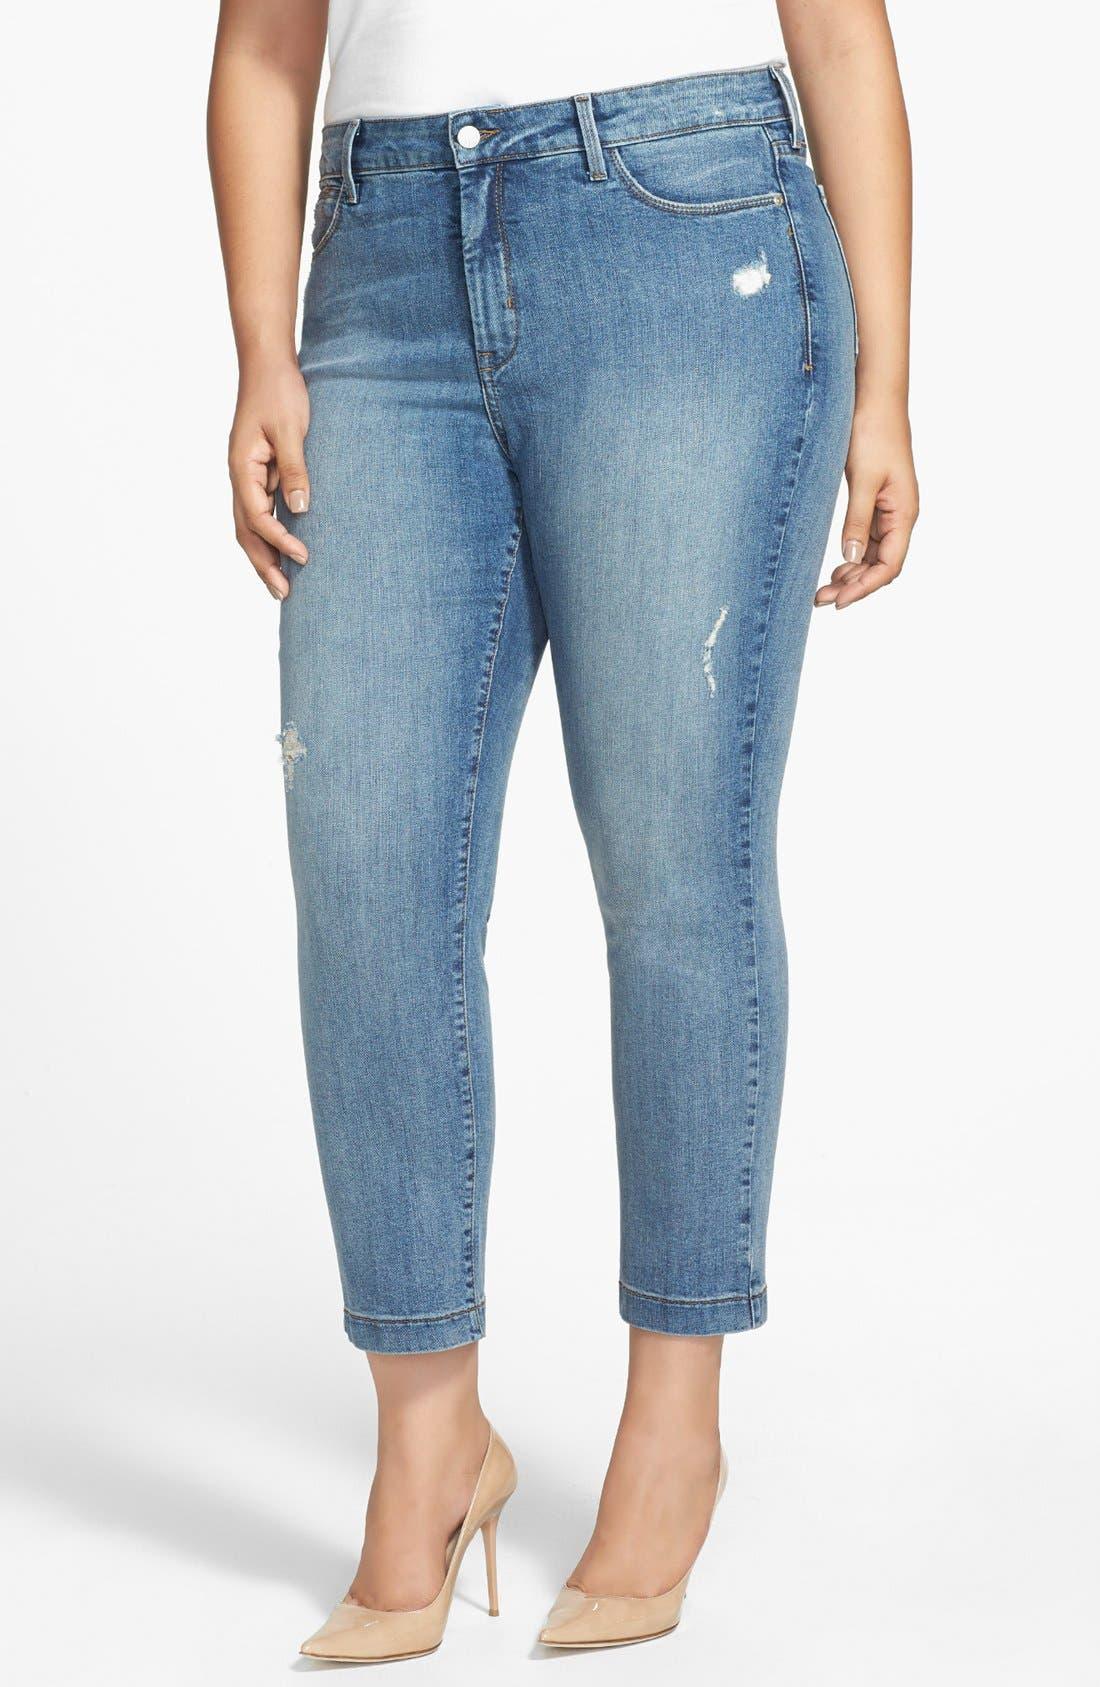 Main Image - NYDJ 'Audrey' Stretch Skinny Ankle Jeans (Plus Size)